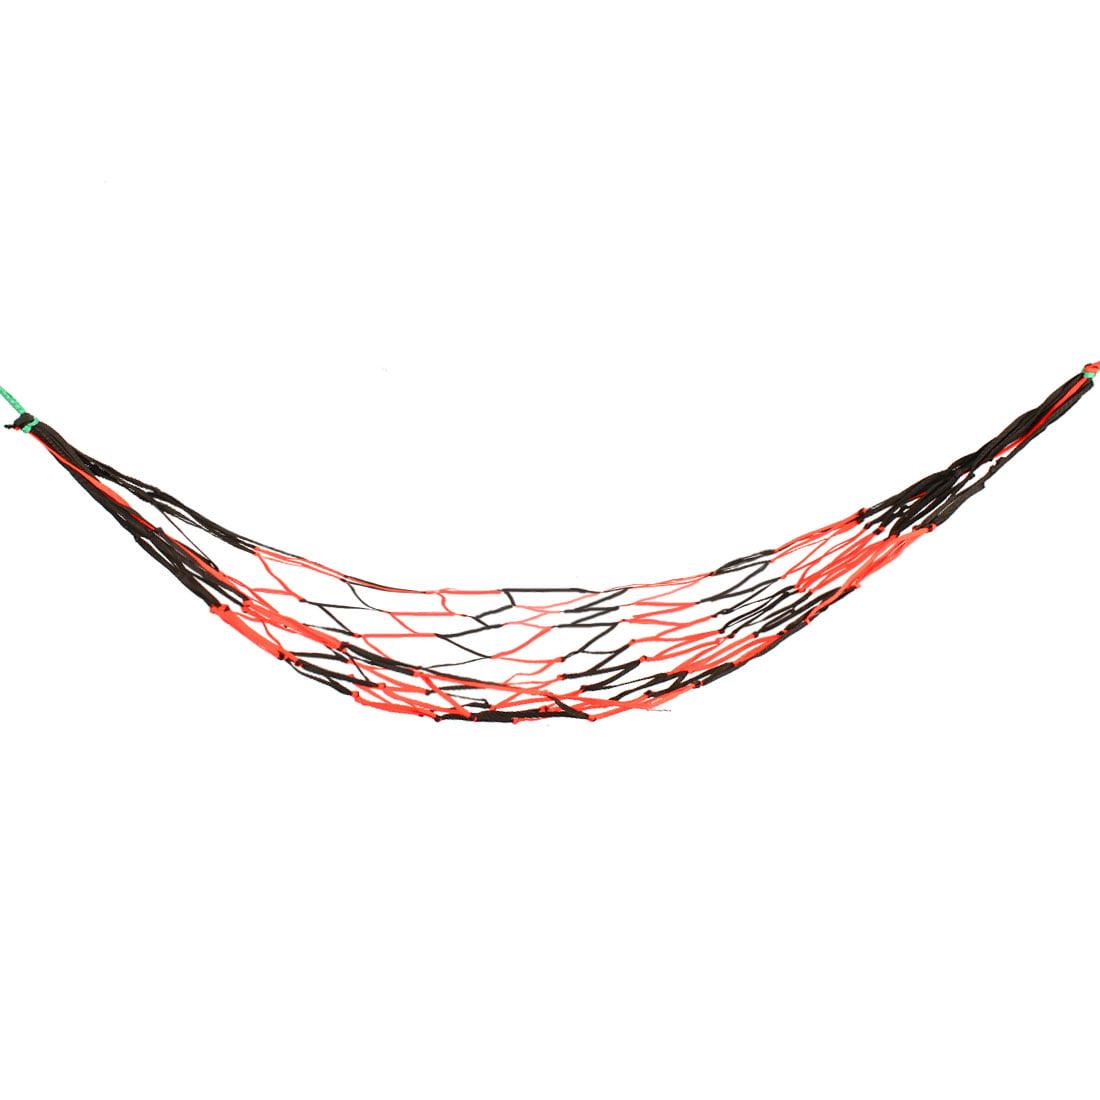 Camping Garden Nylon Meshy Net Hammock Sleeping Bed 2x1.4 M by Unique-Bargains